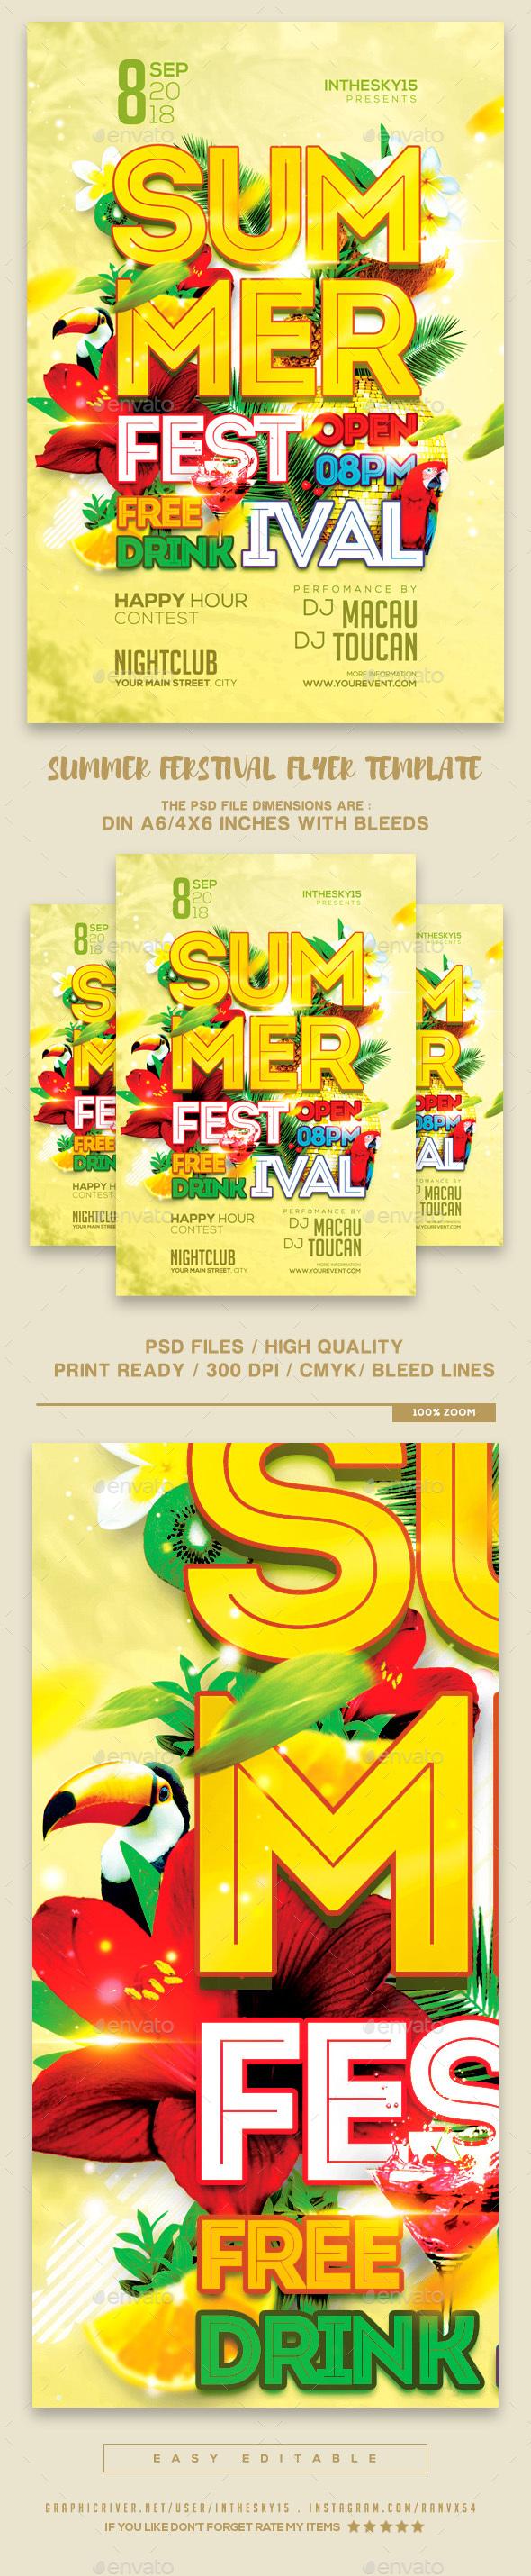 Summer Festival Flyer Template - Flyers Print Templates